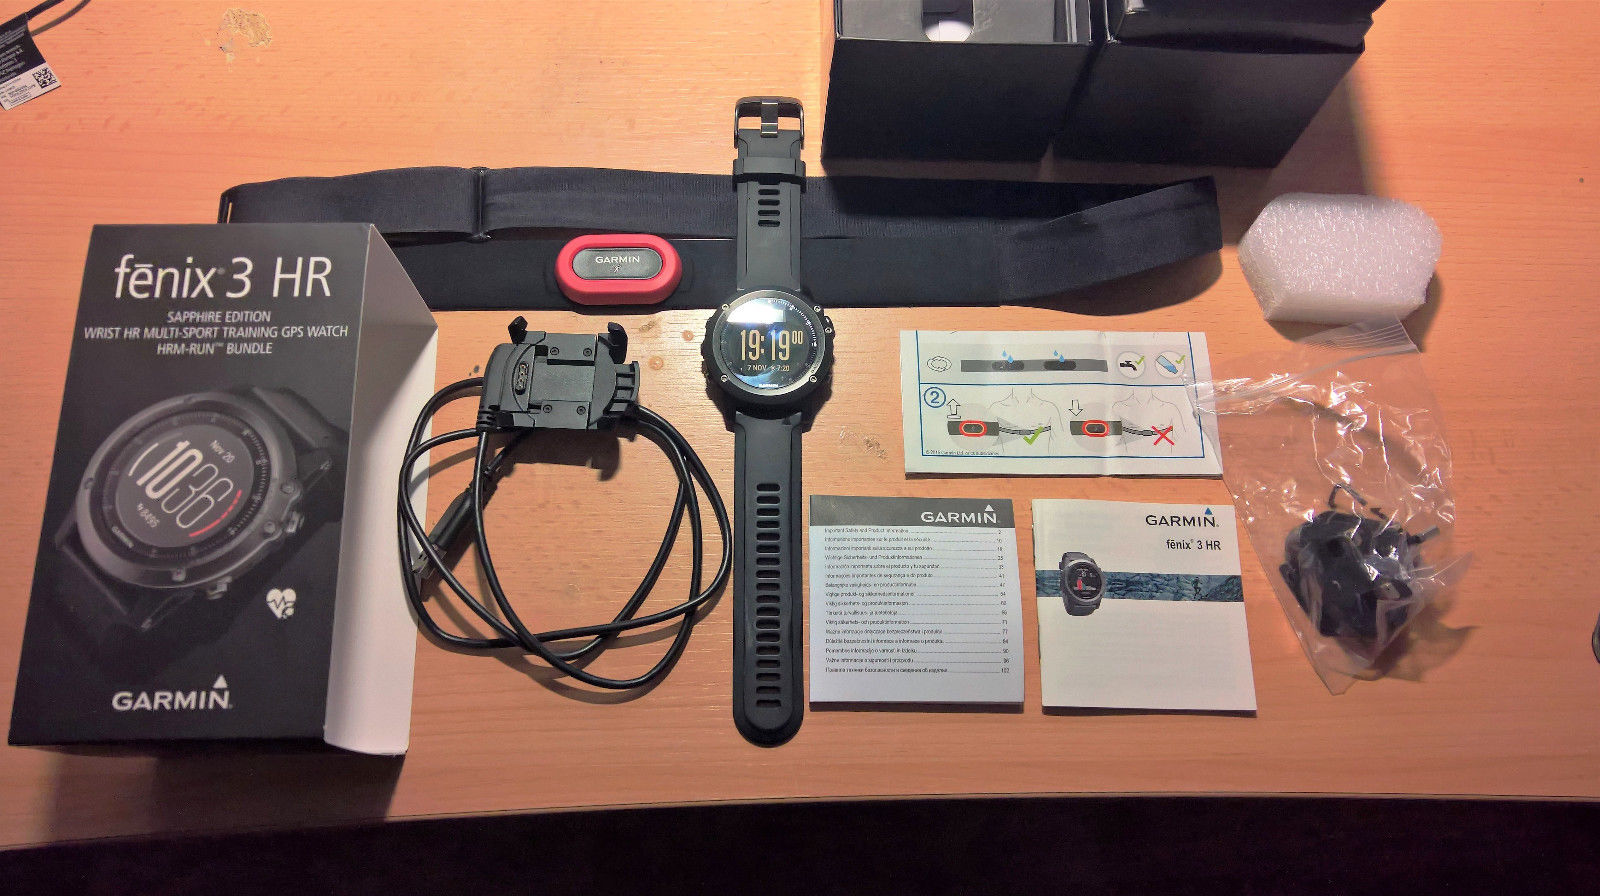 Swarovski Entfernungsmesser Quad : Panasonic lumix dmc fz1000 20.1 mp digitalkamera schwarz